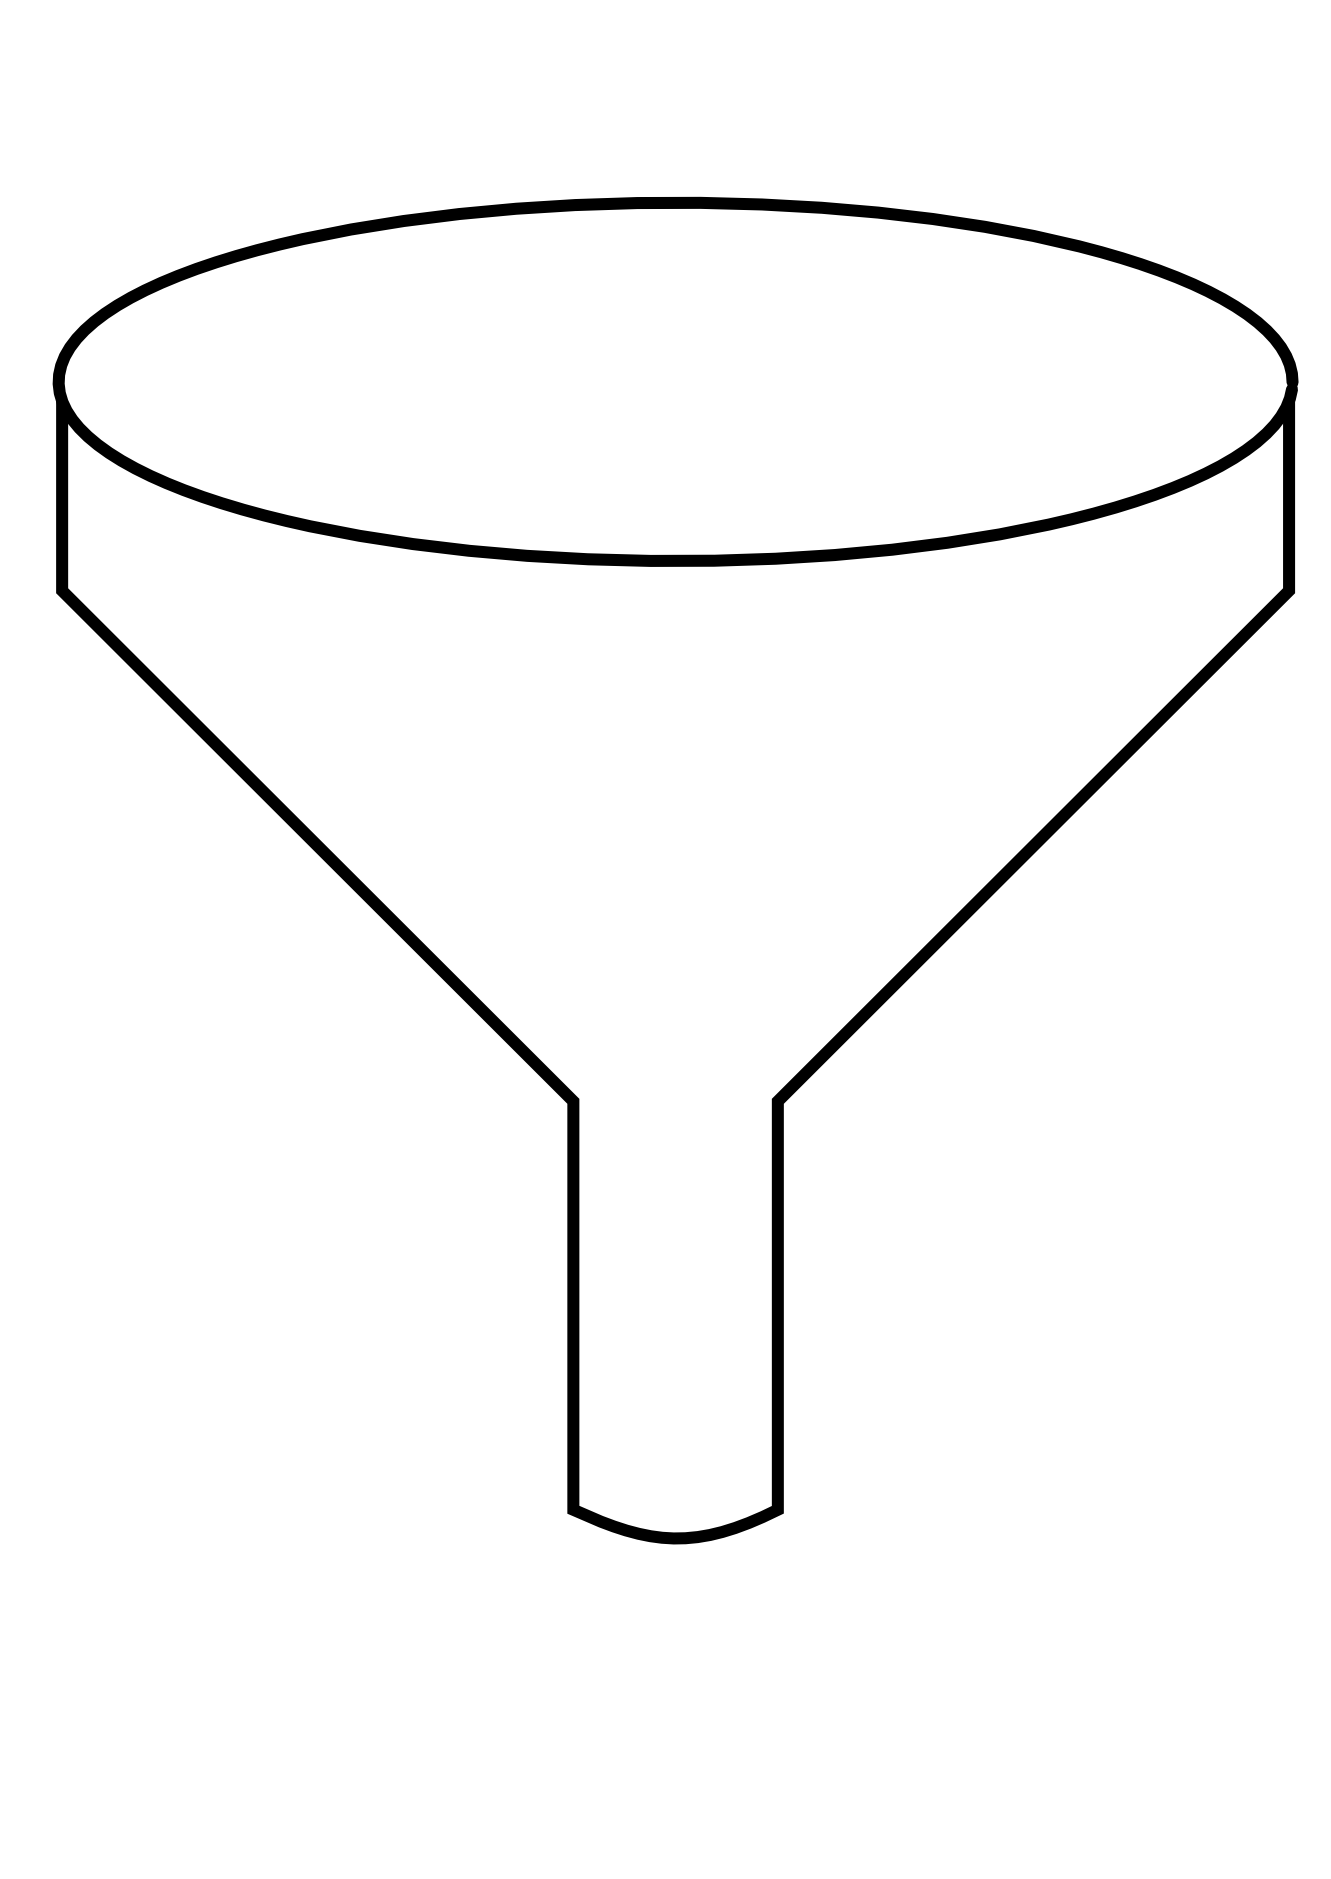 Line Art Svg : Food green funnel black white line art scalable vector